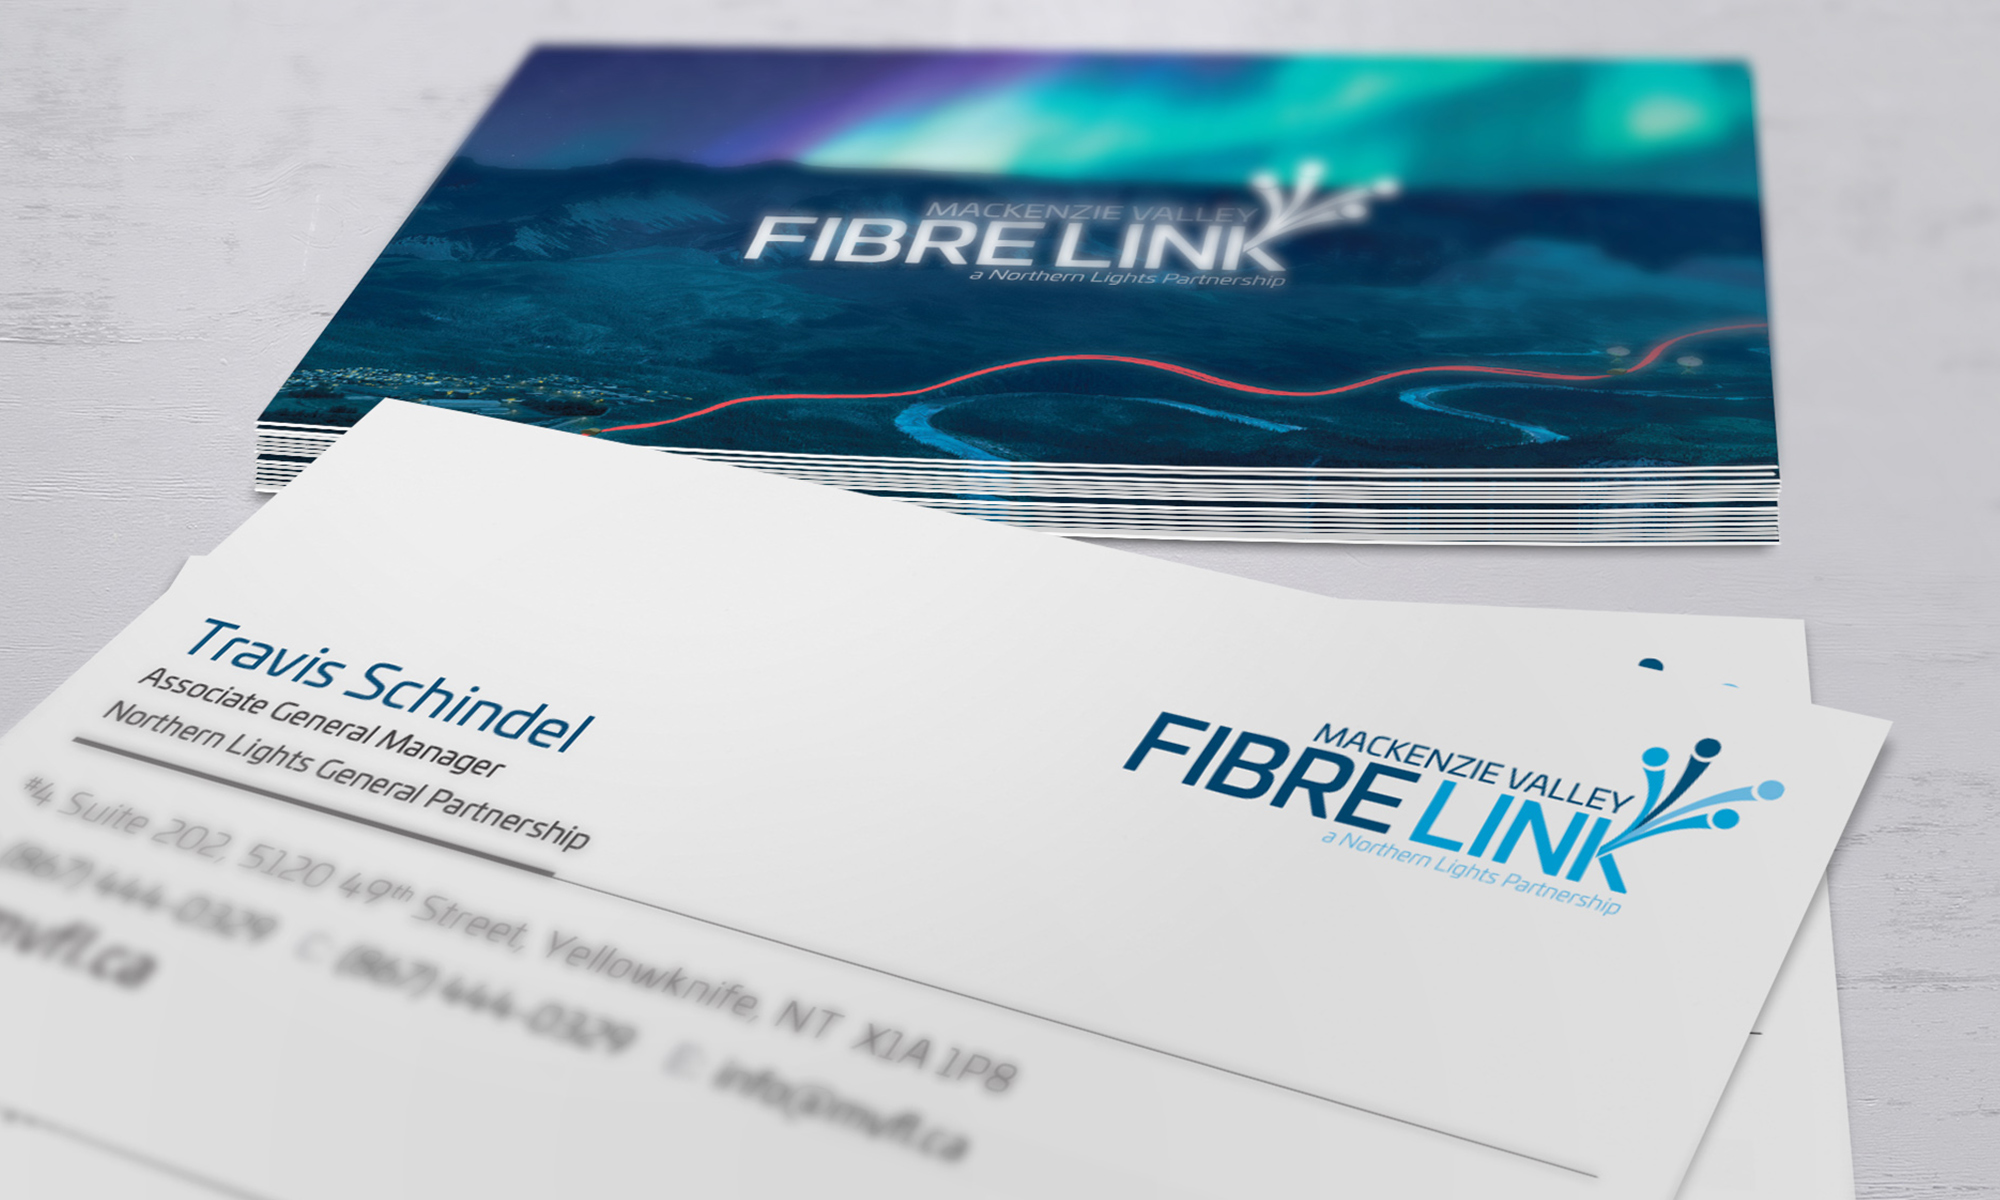 Example of business card design for Mackenzie Valley Fibrelink.